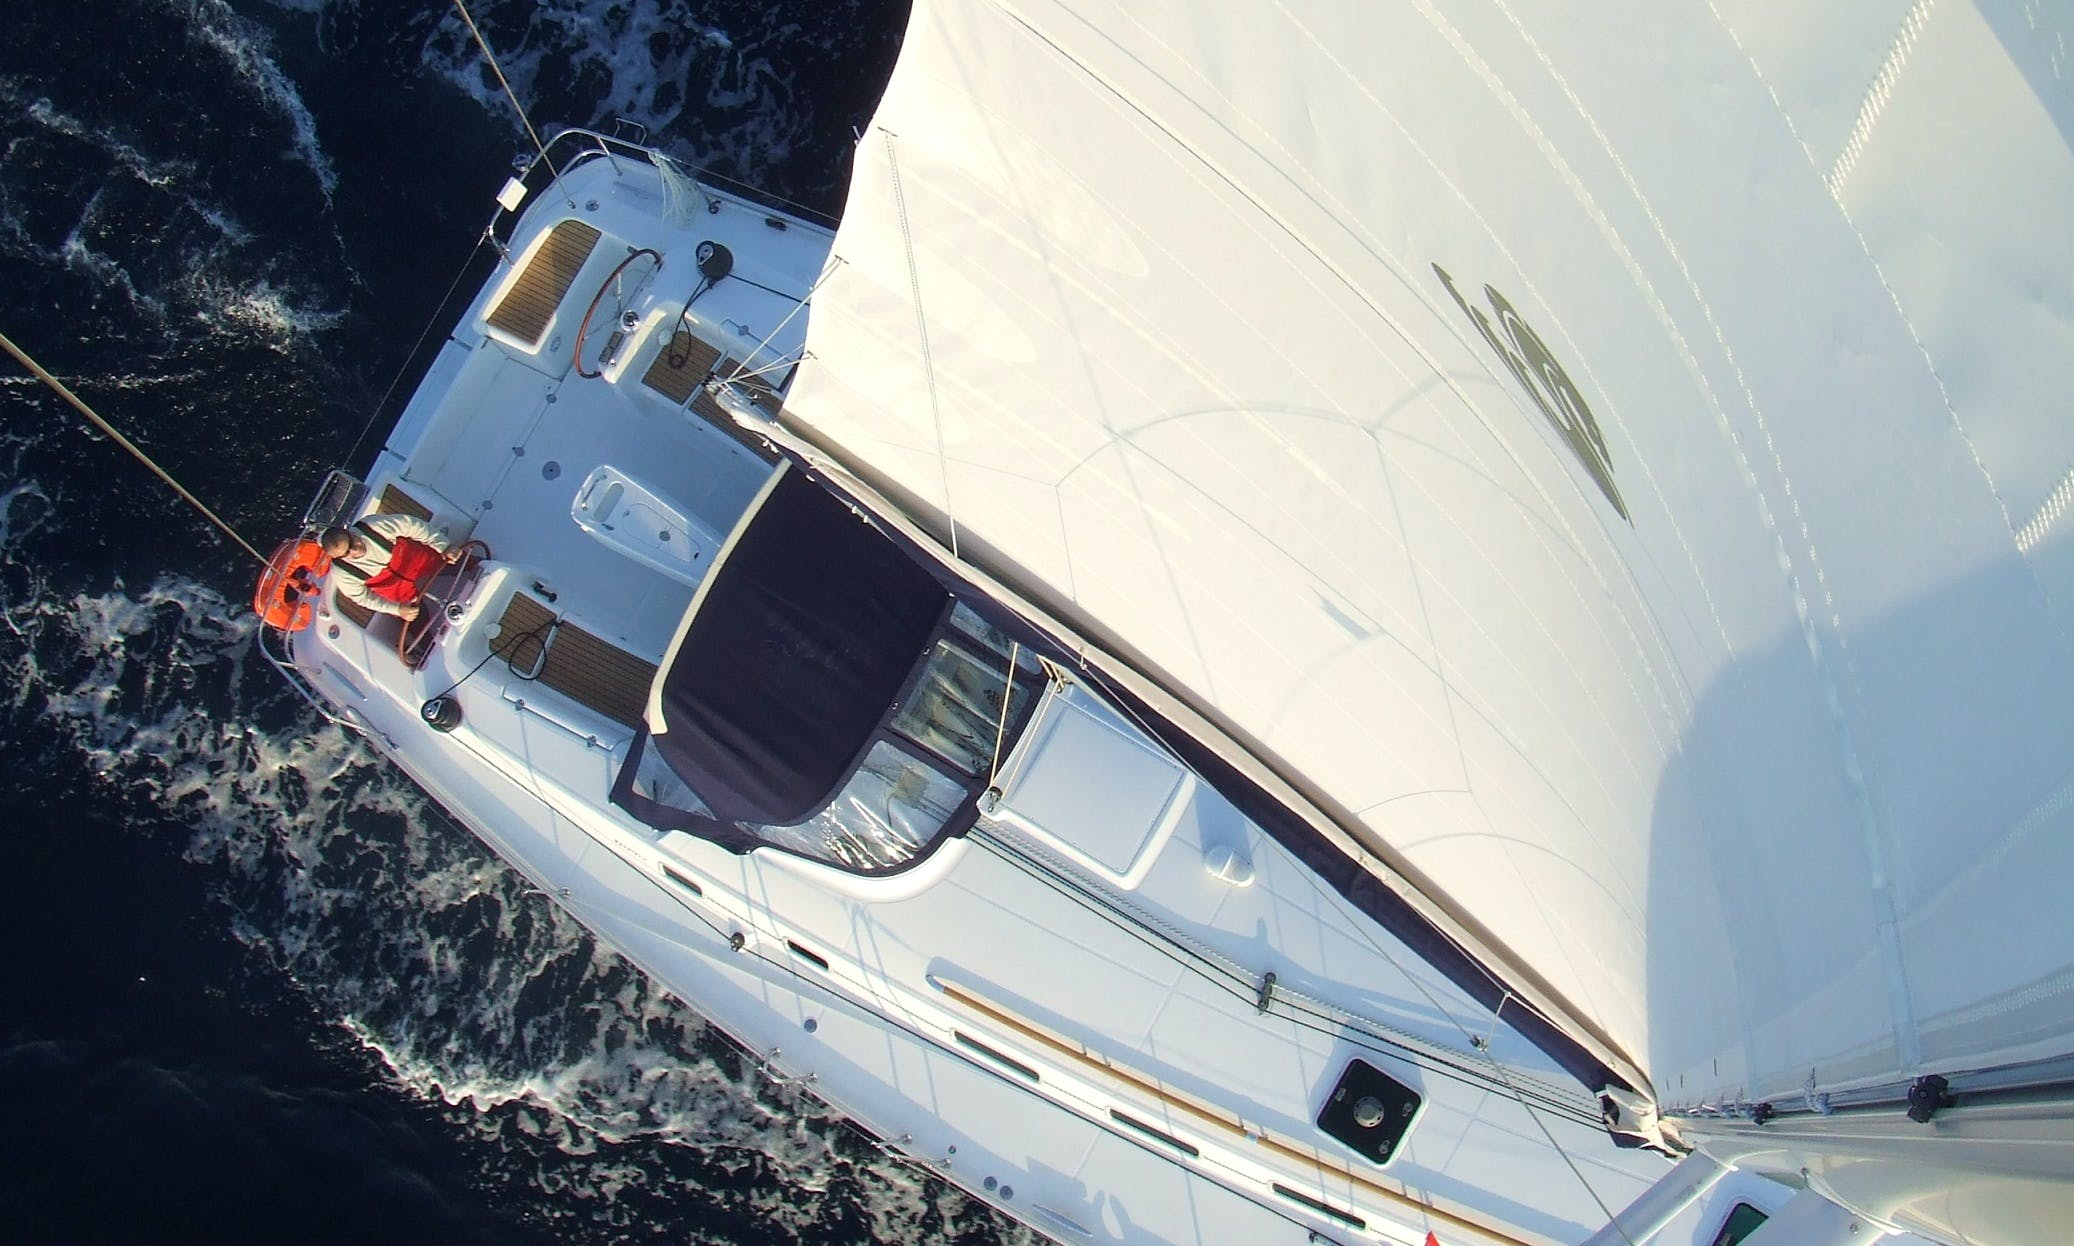 Beneteau Cyclades 50.5 Charter in Swatar, Malta